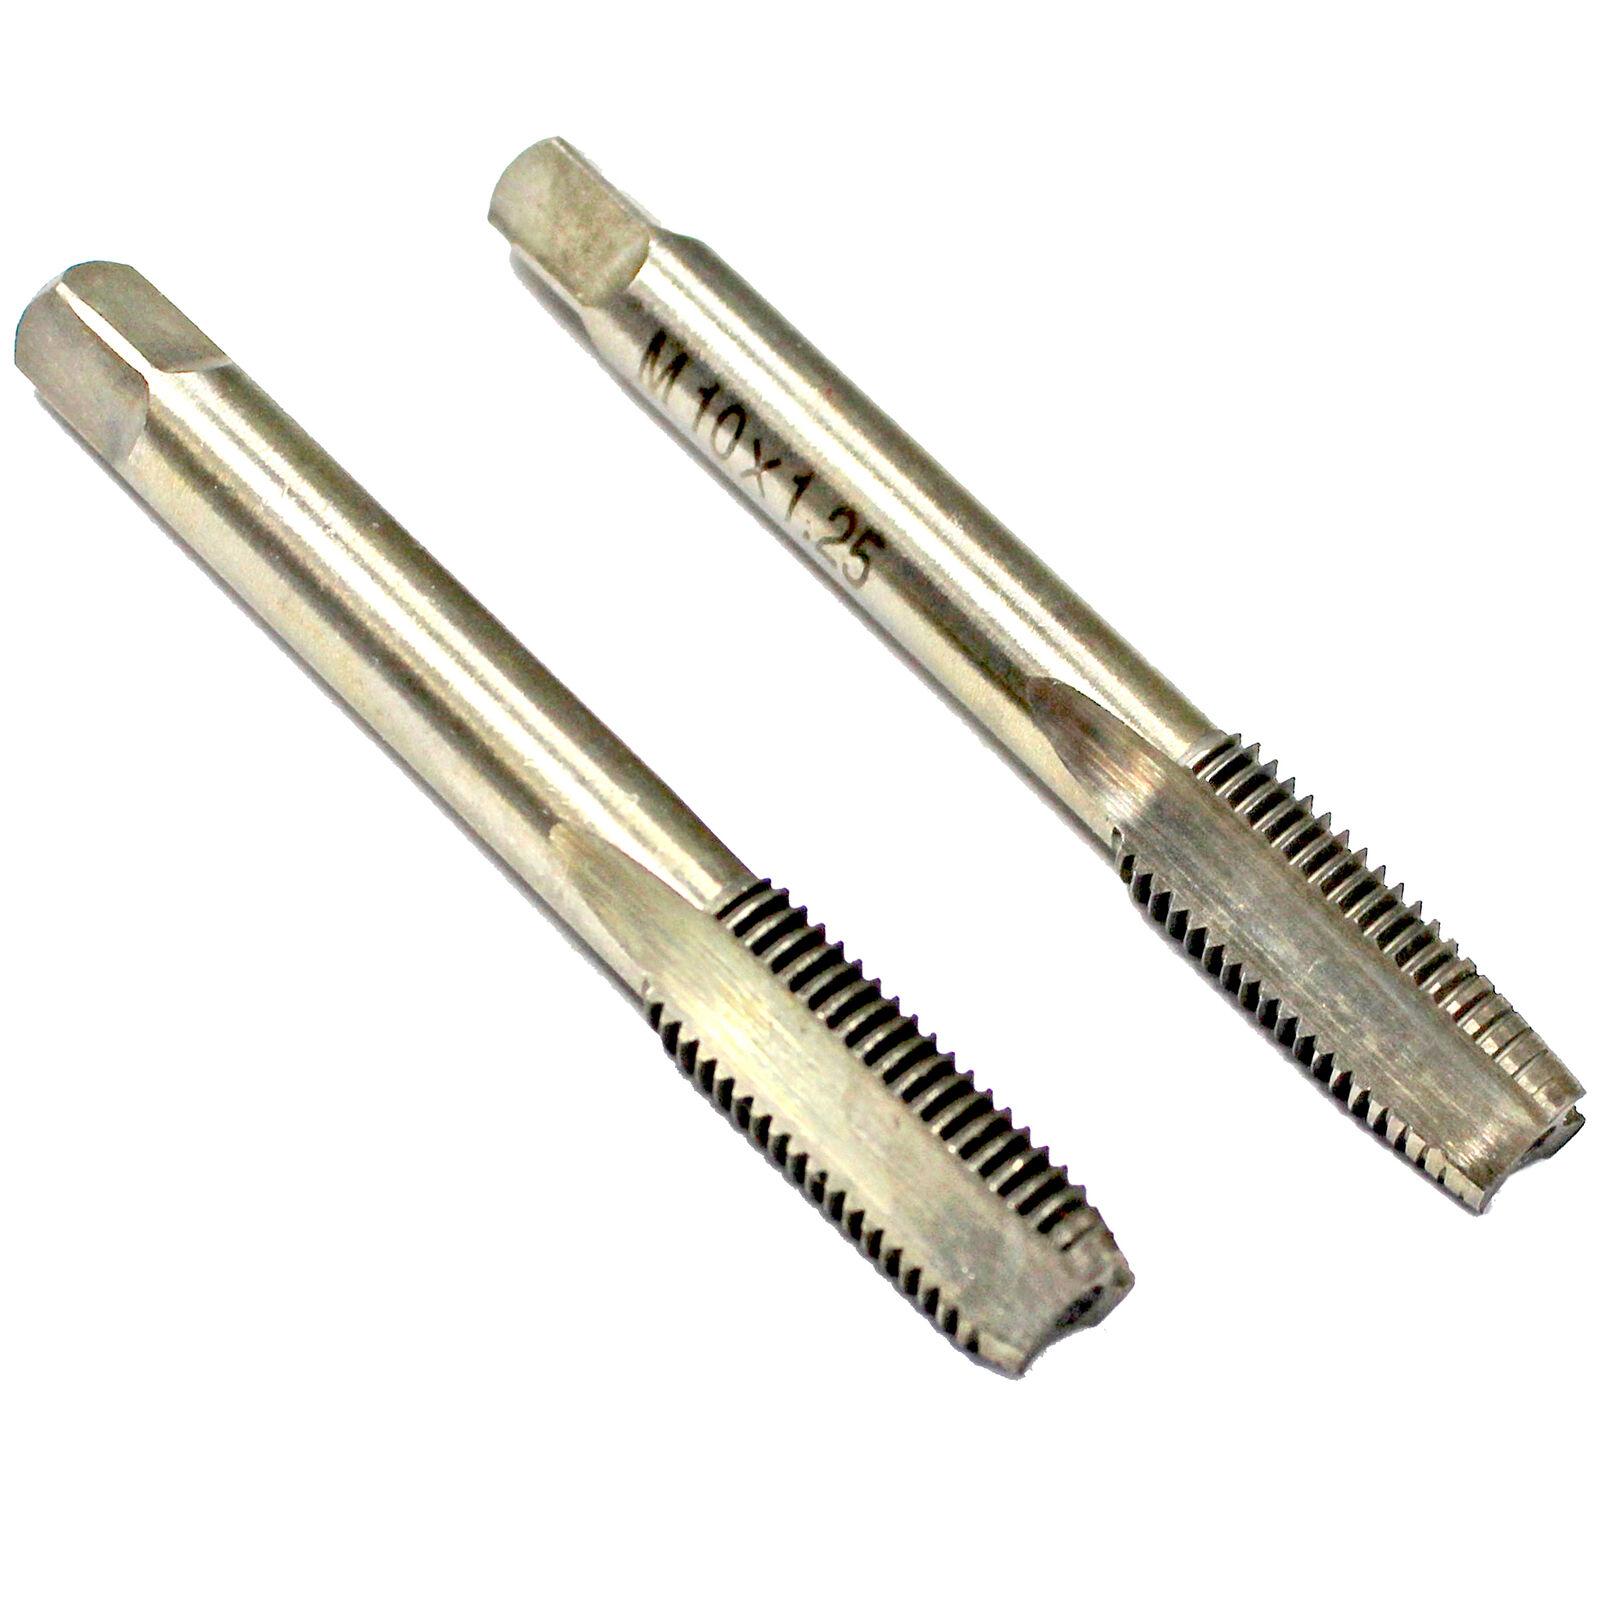 HSS 12mm x1.25 Metric Taper and Plug Tap Right Hand Thread M12x1.25mm Pitch